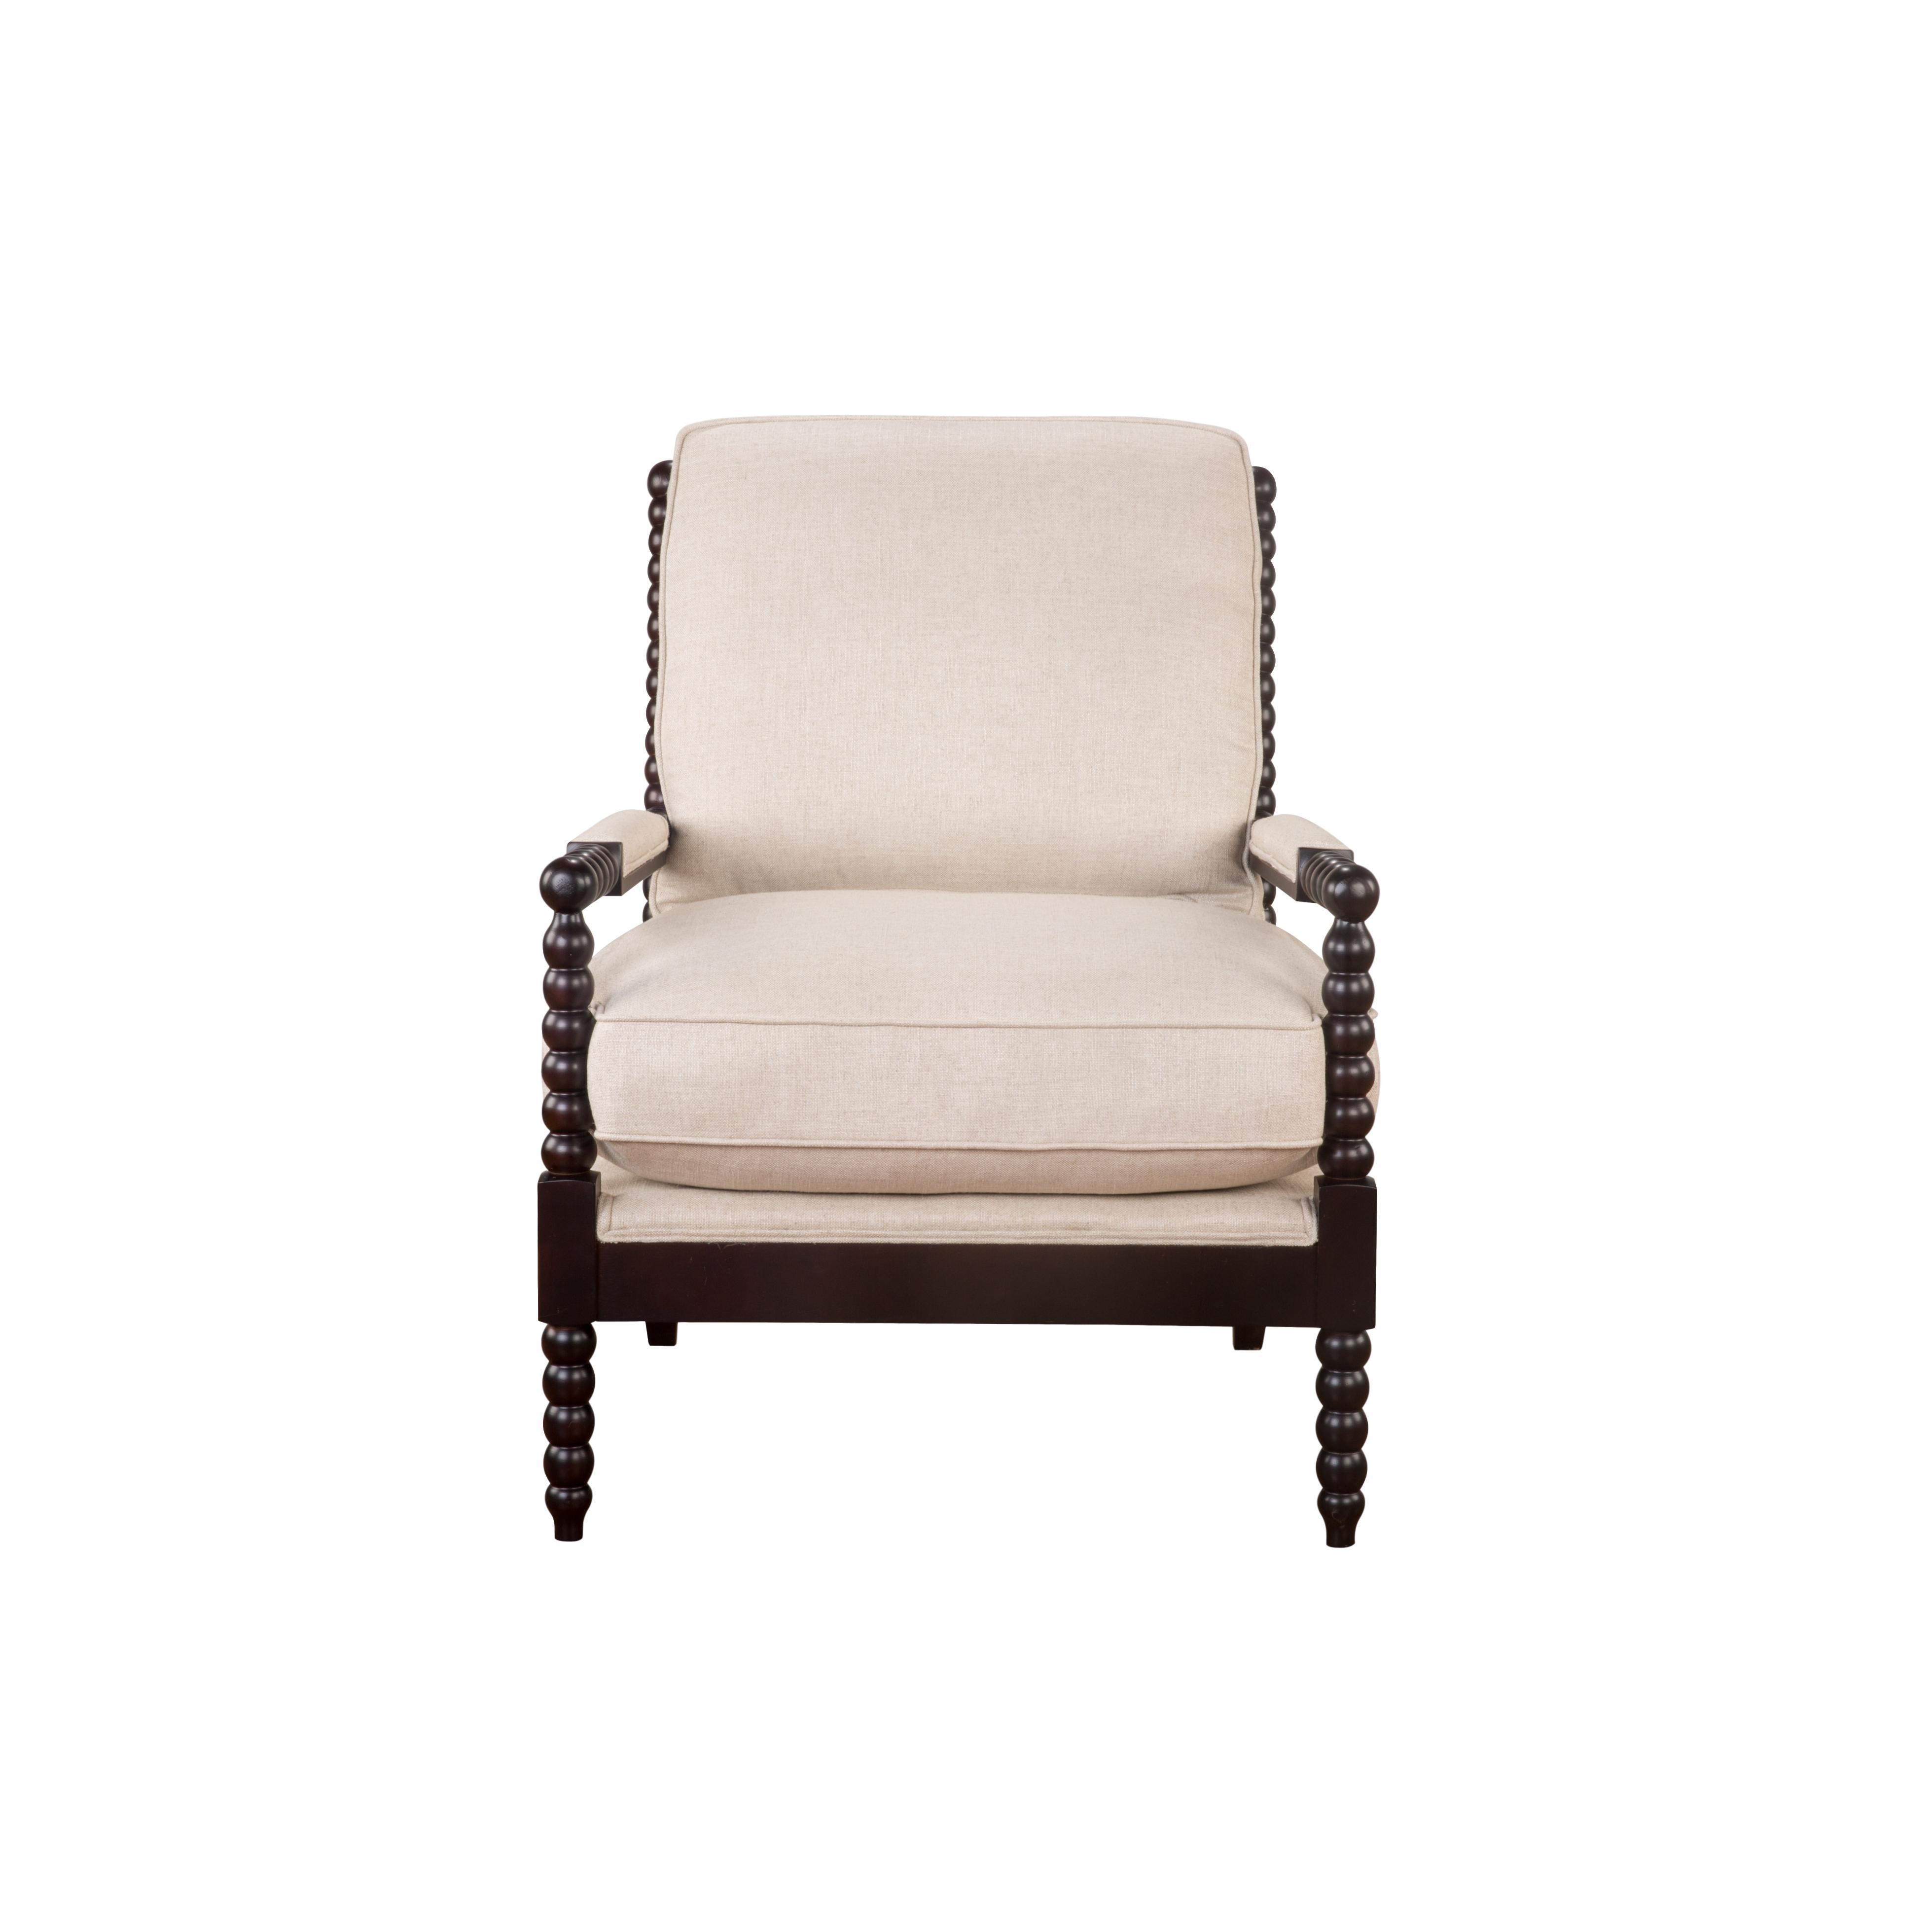 spindle chair santa barbara design center -